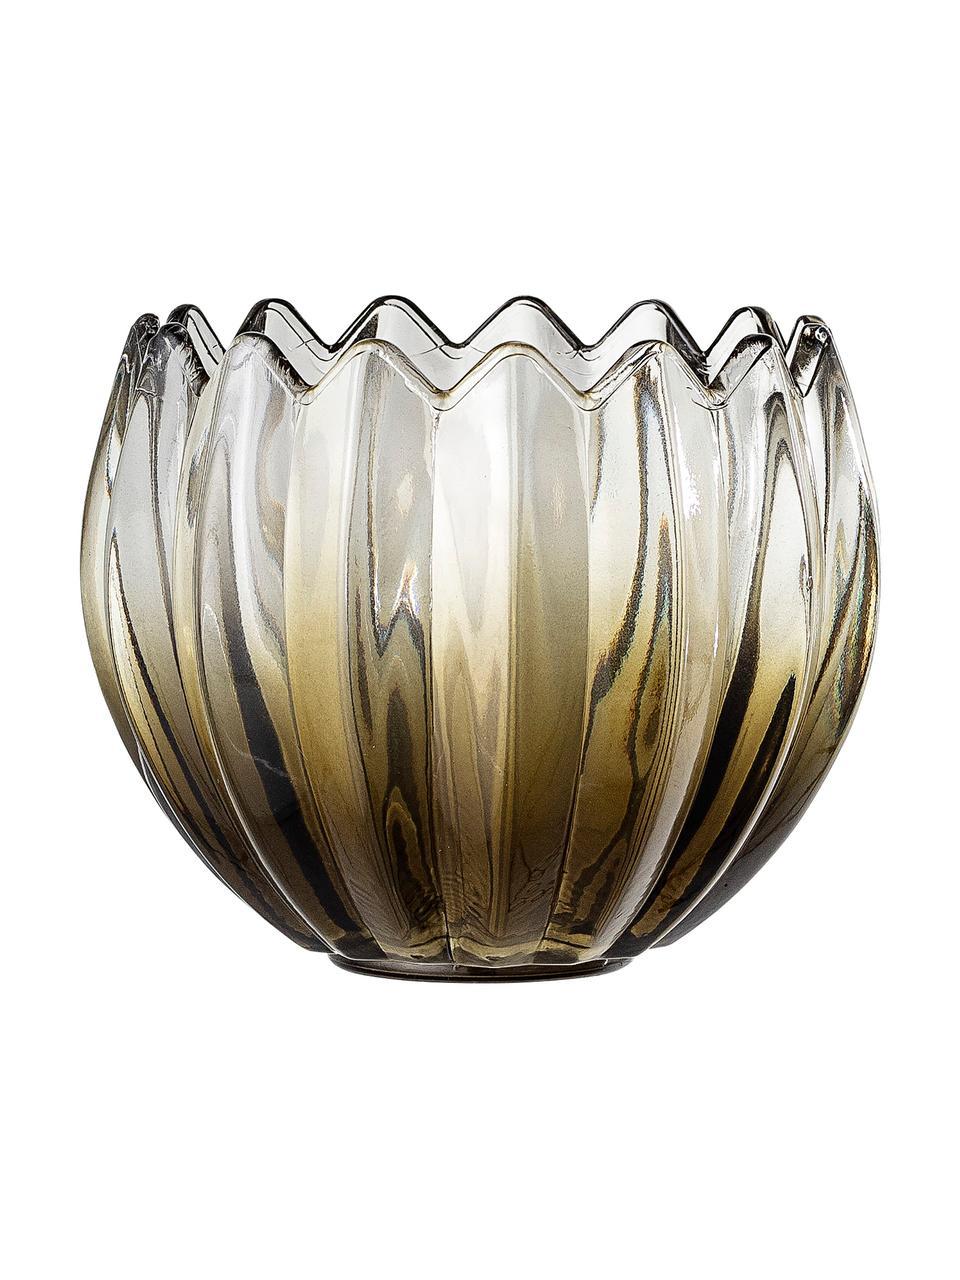 Waxinelichthouder Viva, Glas, Groen, transparant, Ø 13 x H 11 cm